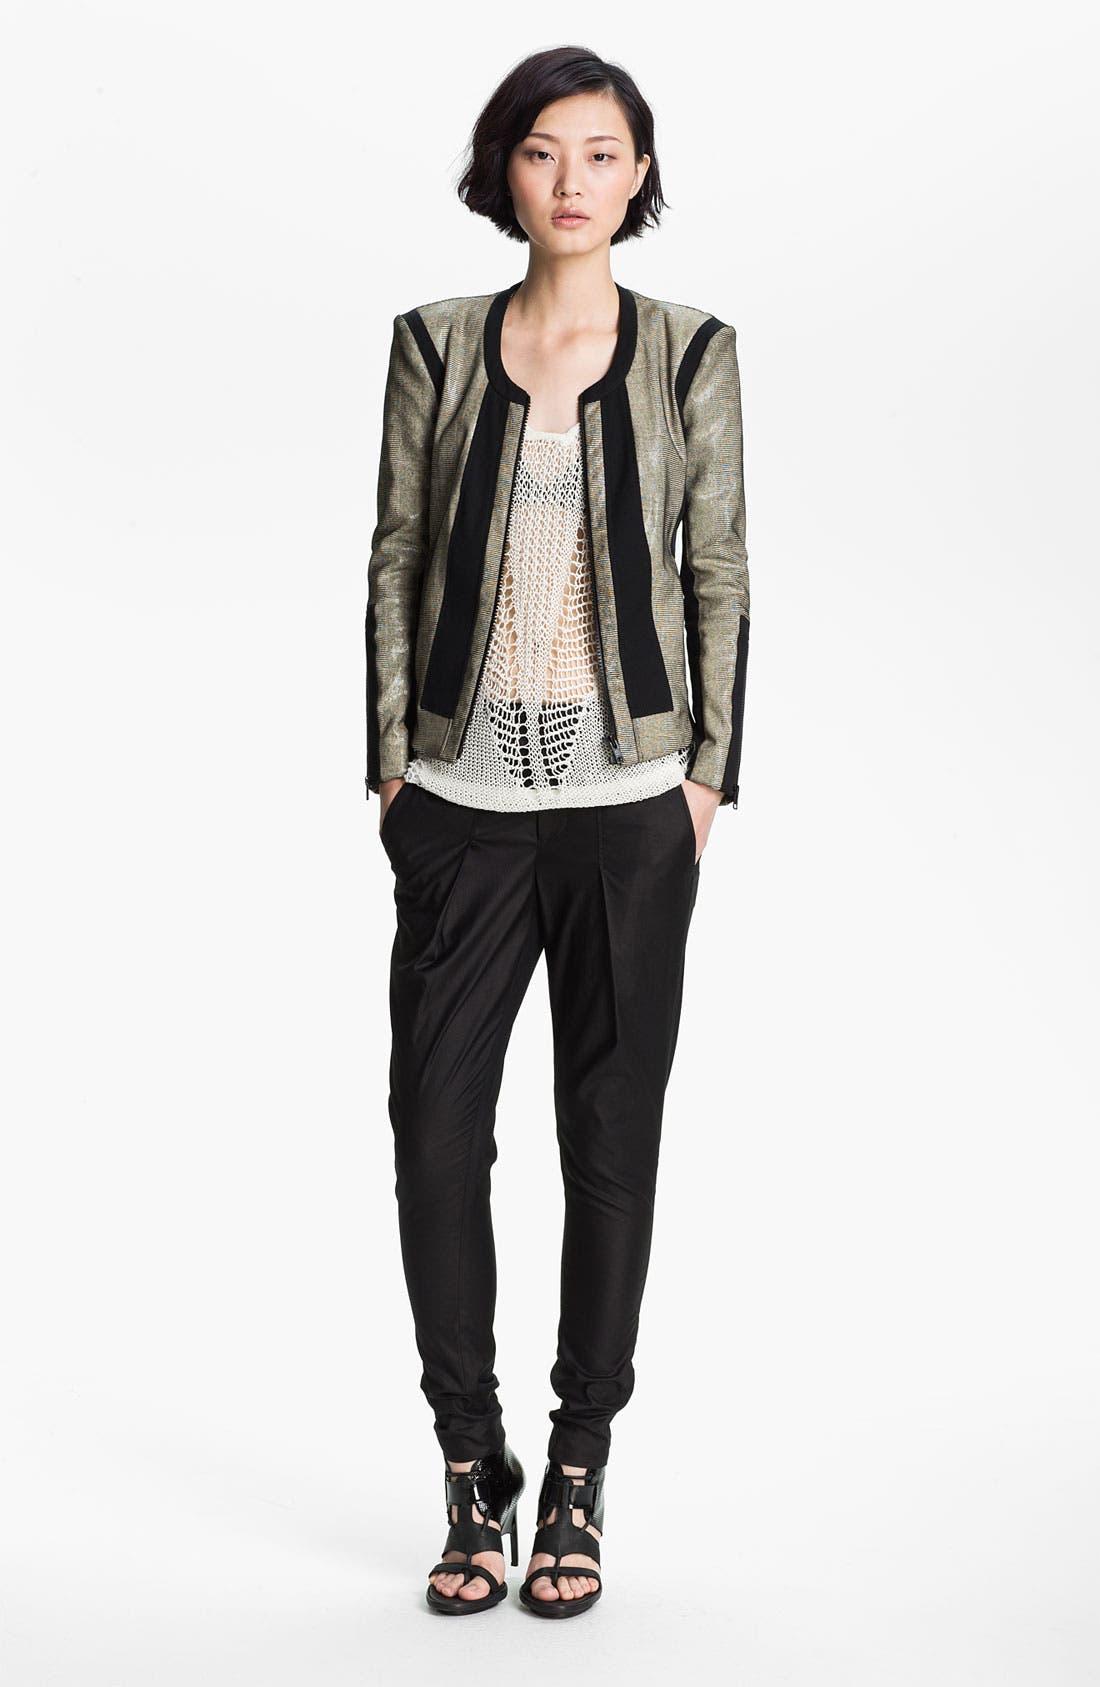 Alternate Image 1 Selected - Helmut Lang 'Rift' Stretch Leather Jacket